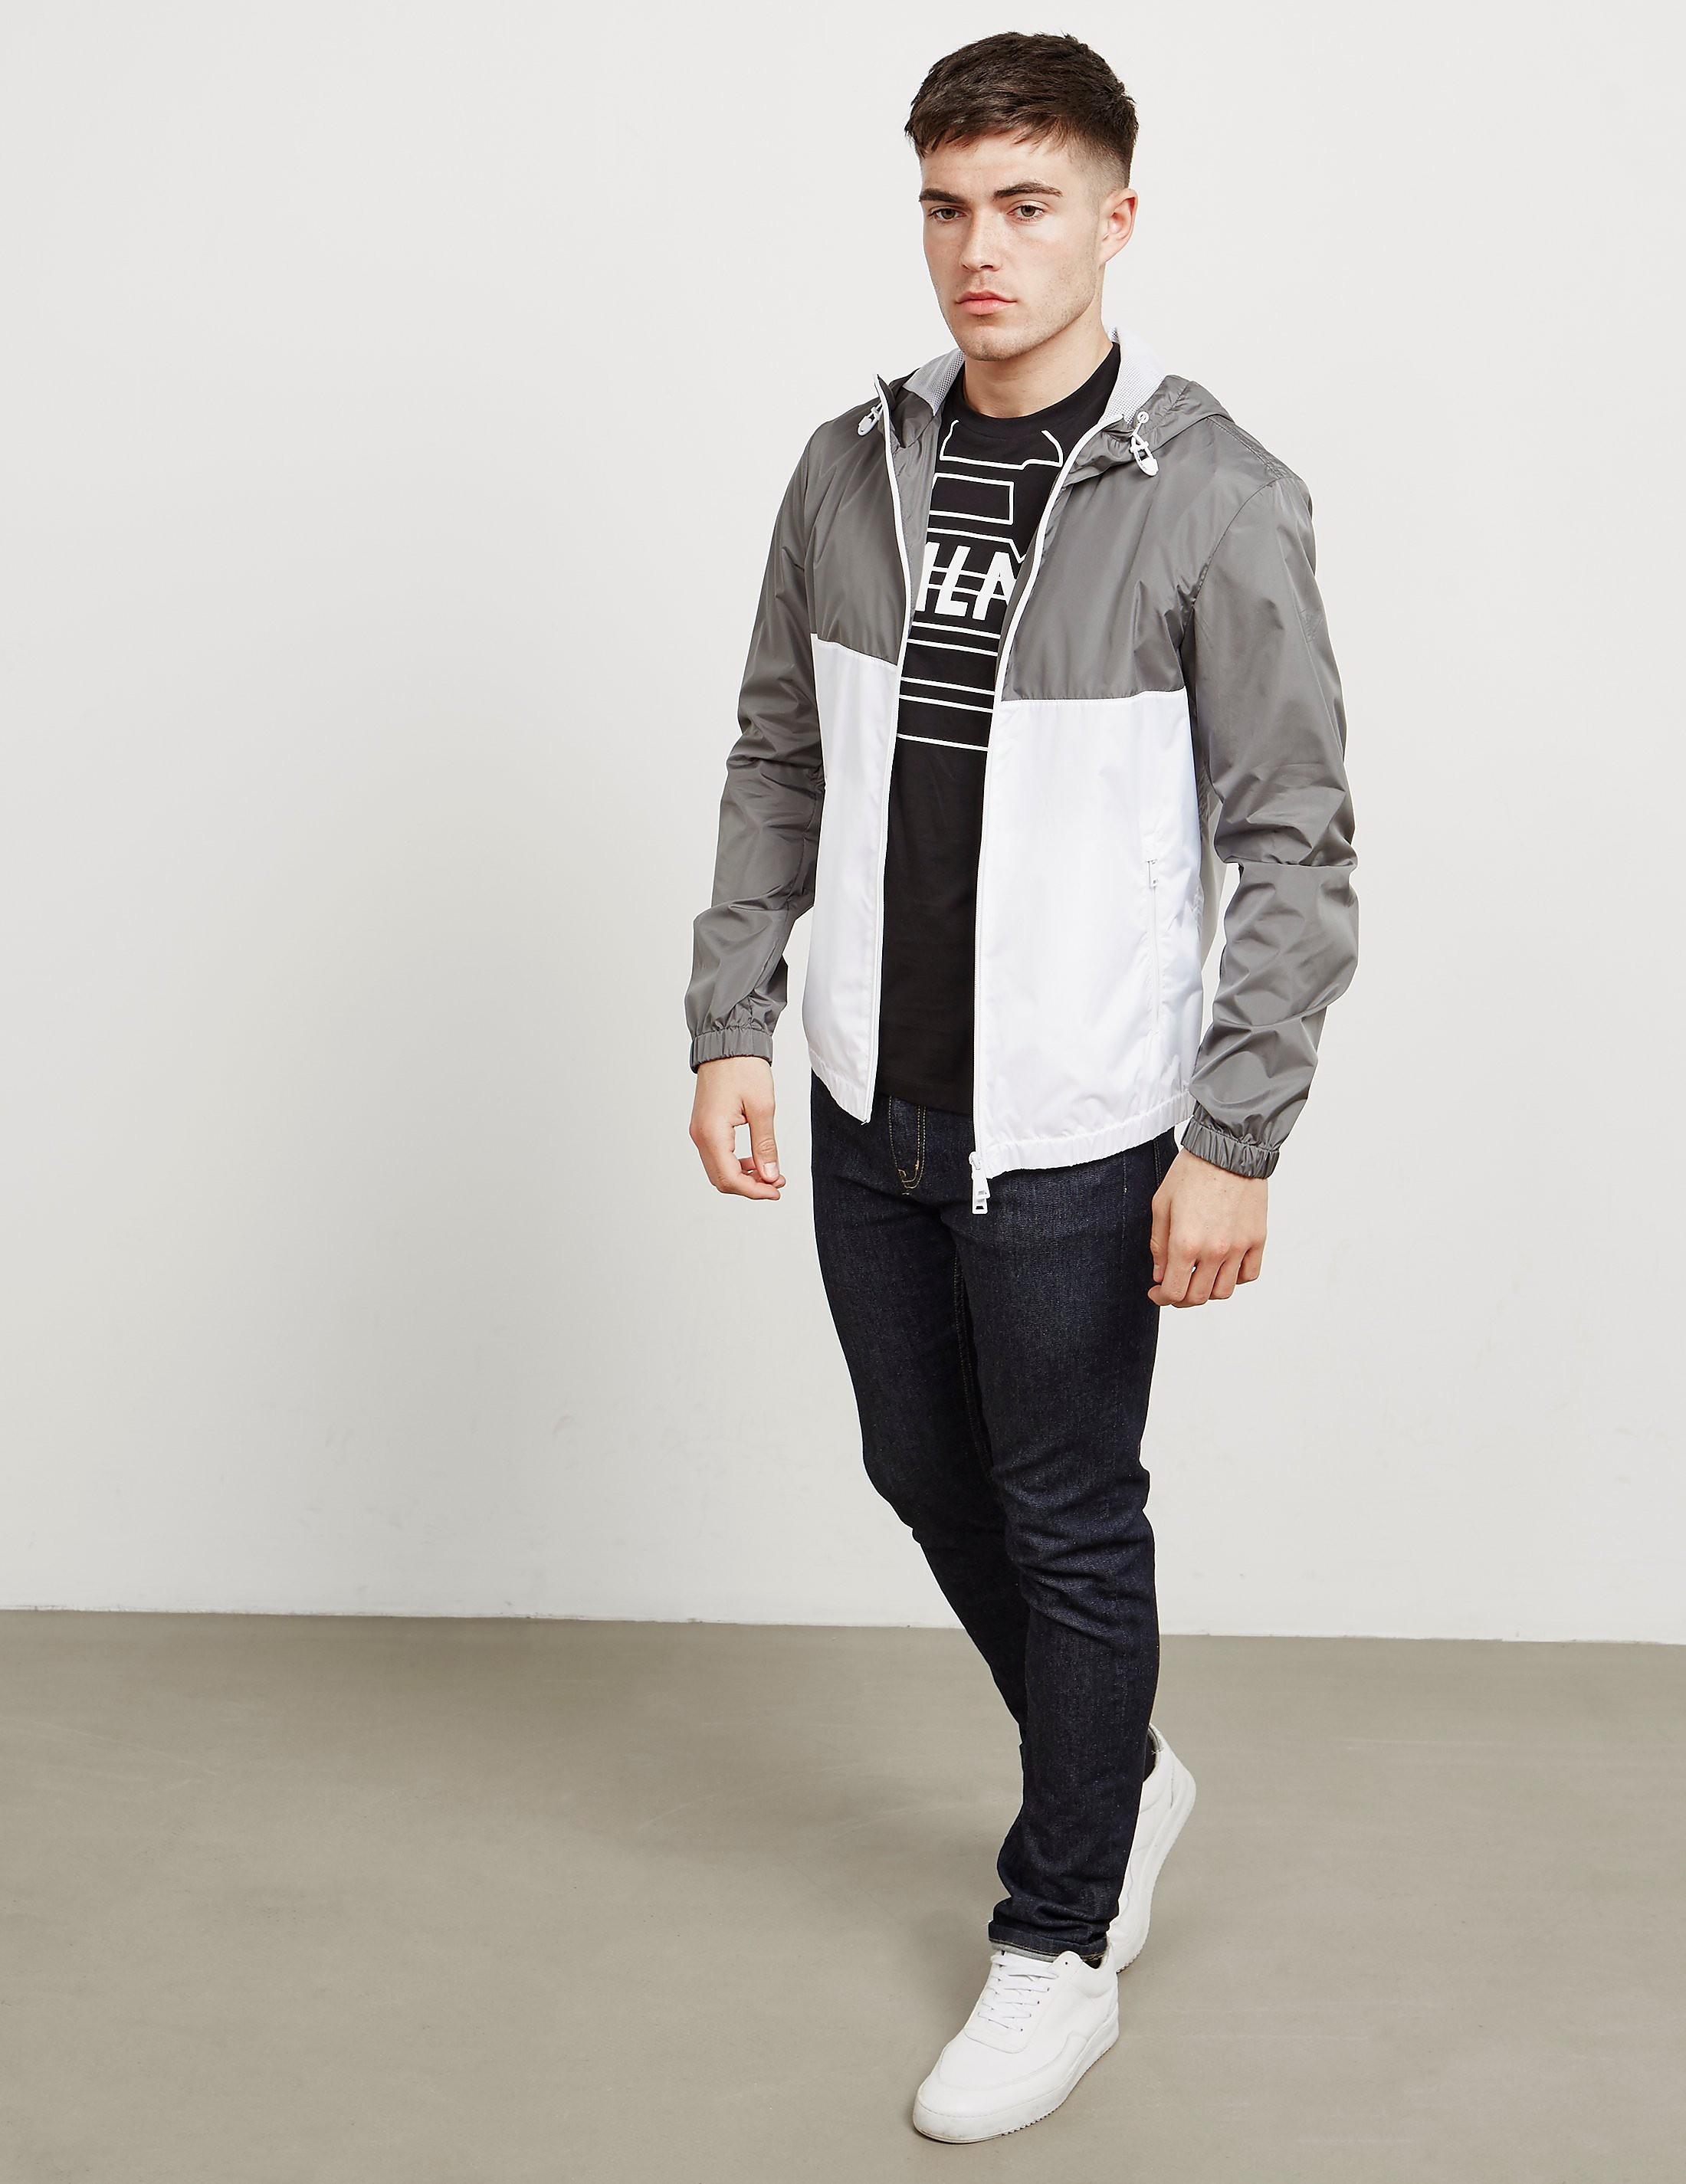 Emporio Armani Block Colour Hooded Jacket